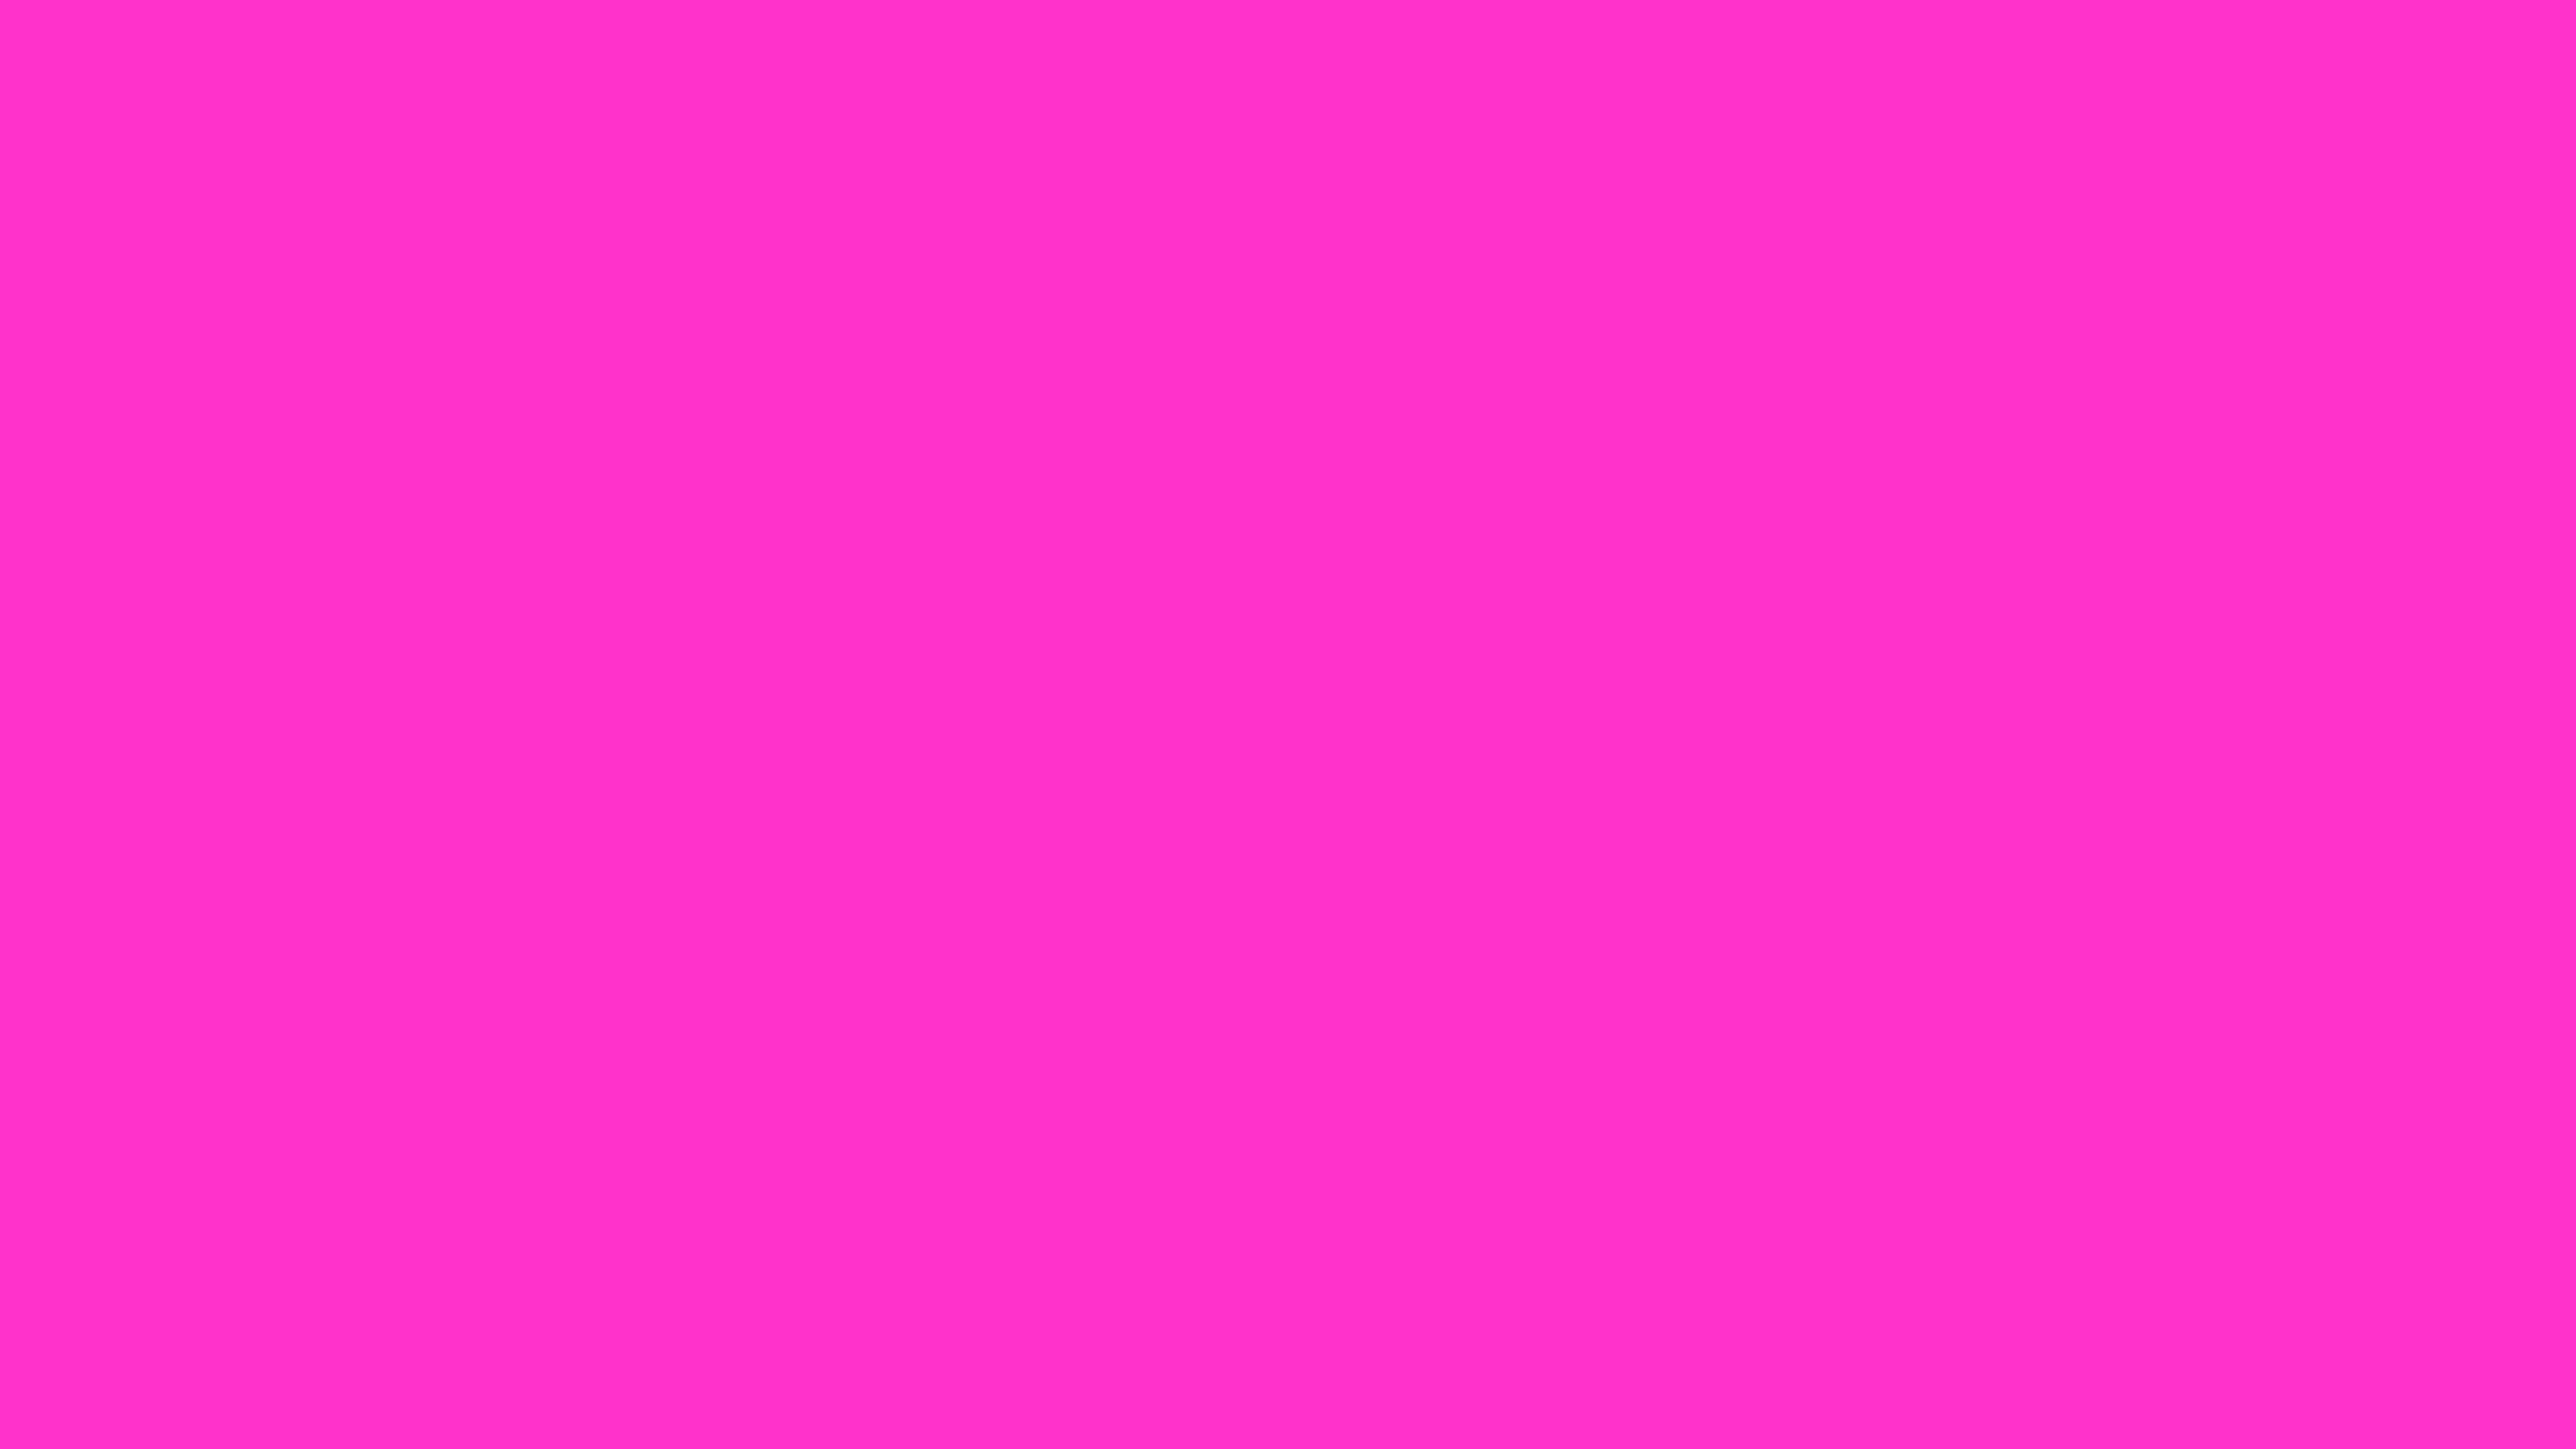 5120x2880 Razzle Dazzle Rose Solid Color Background